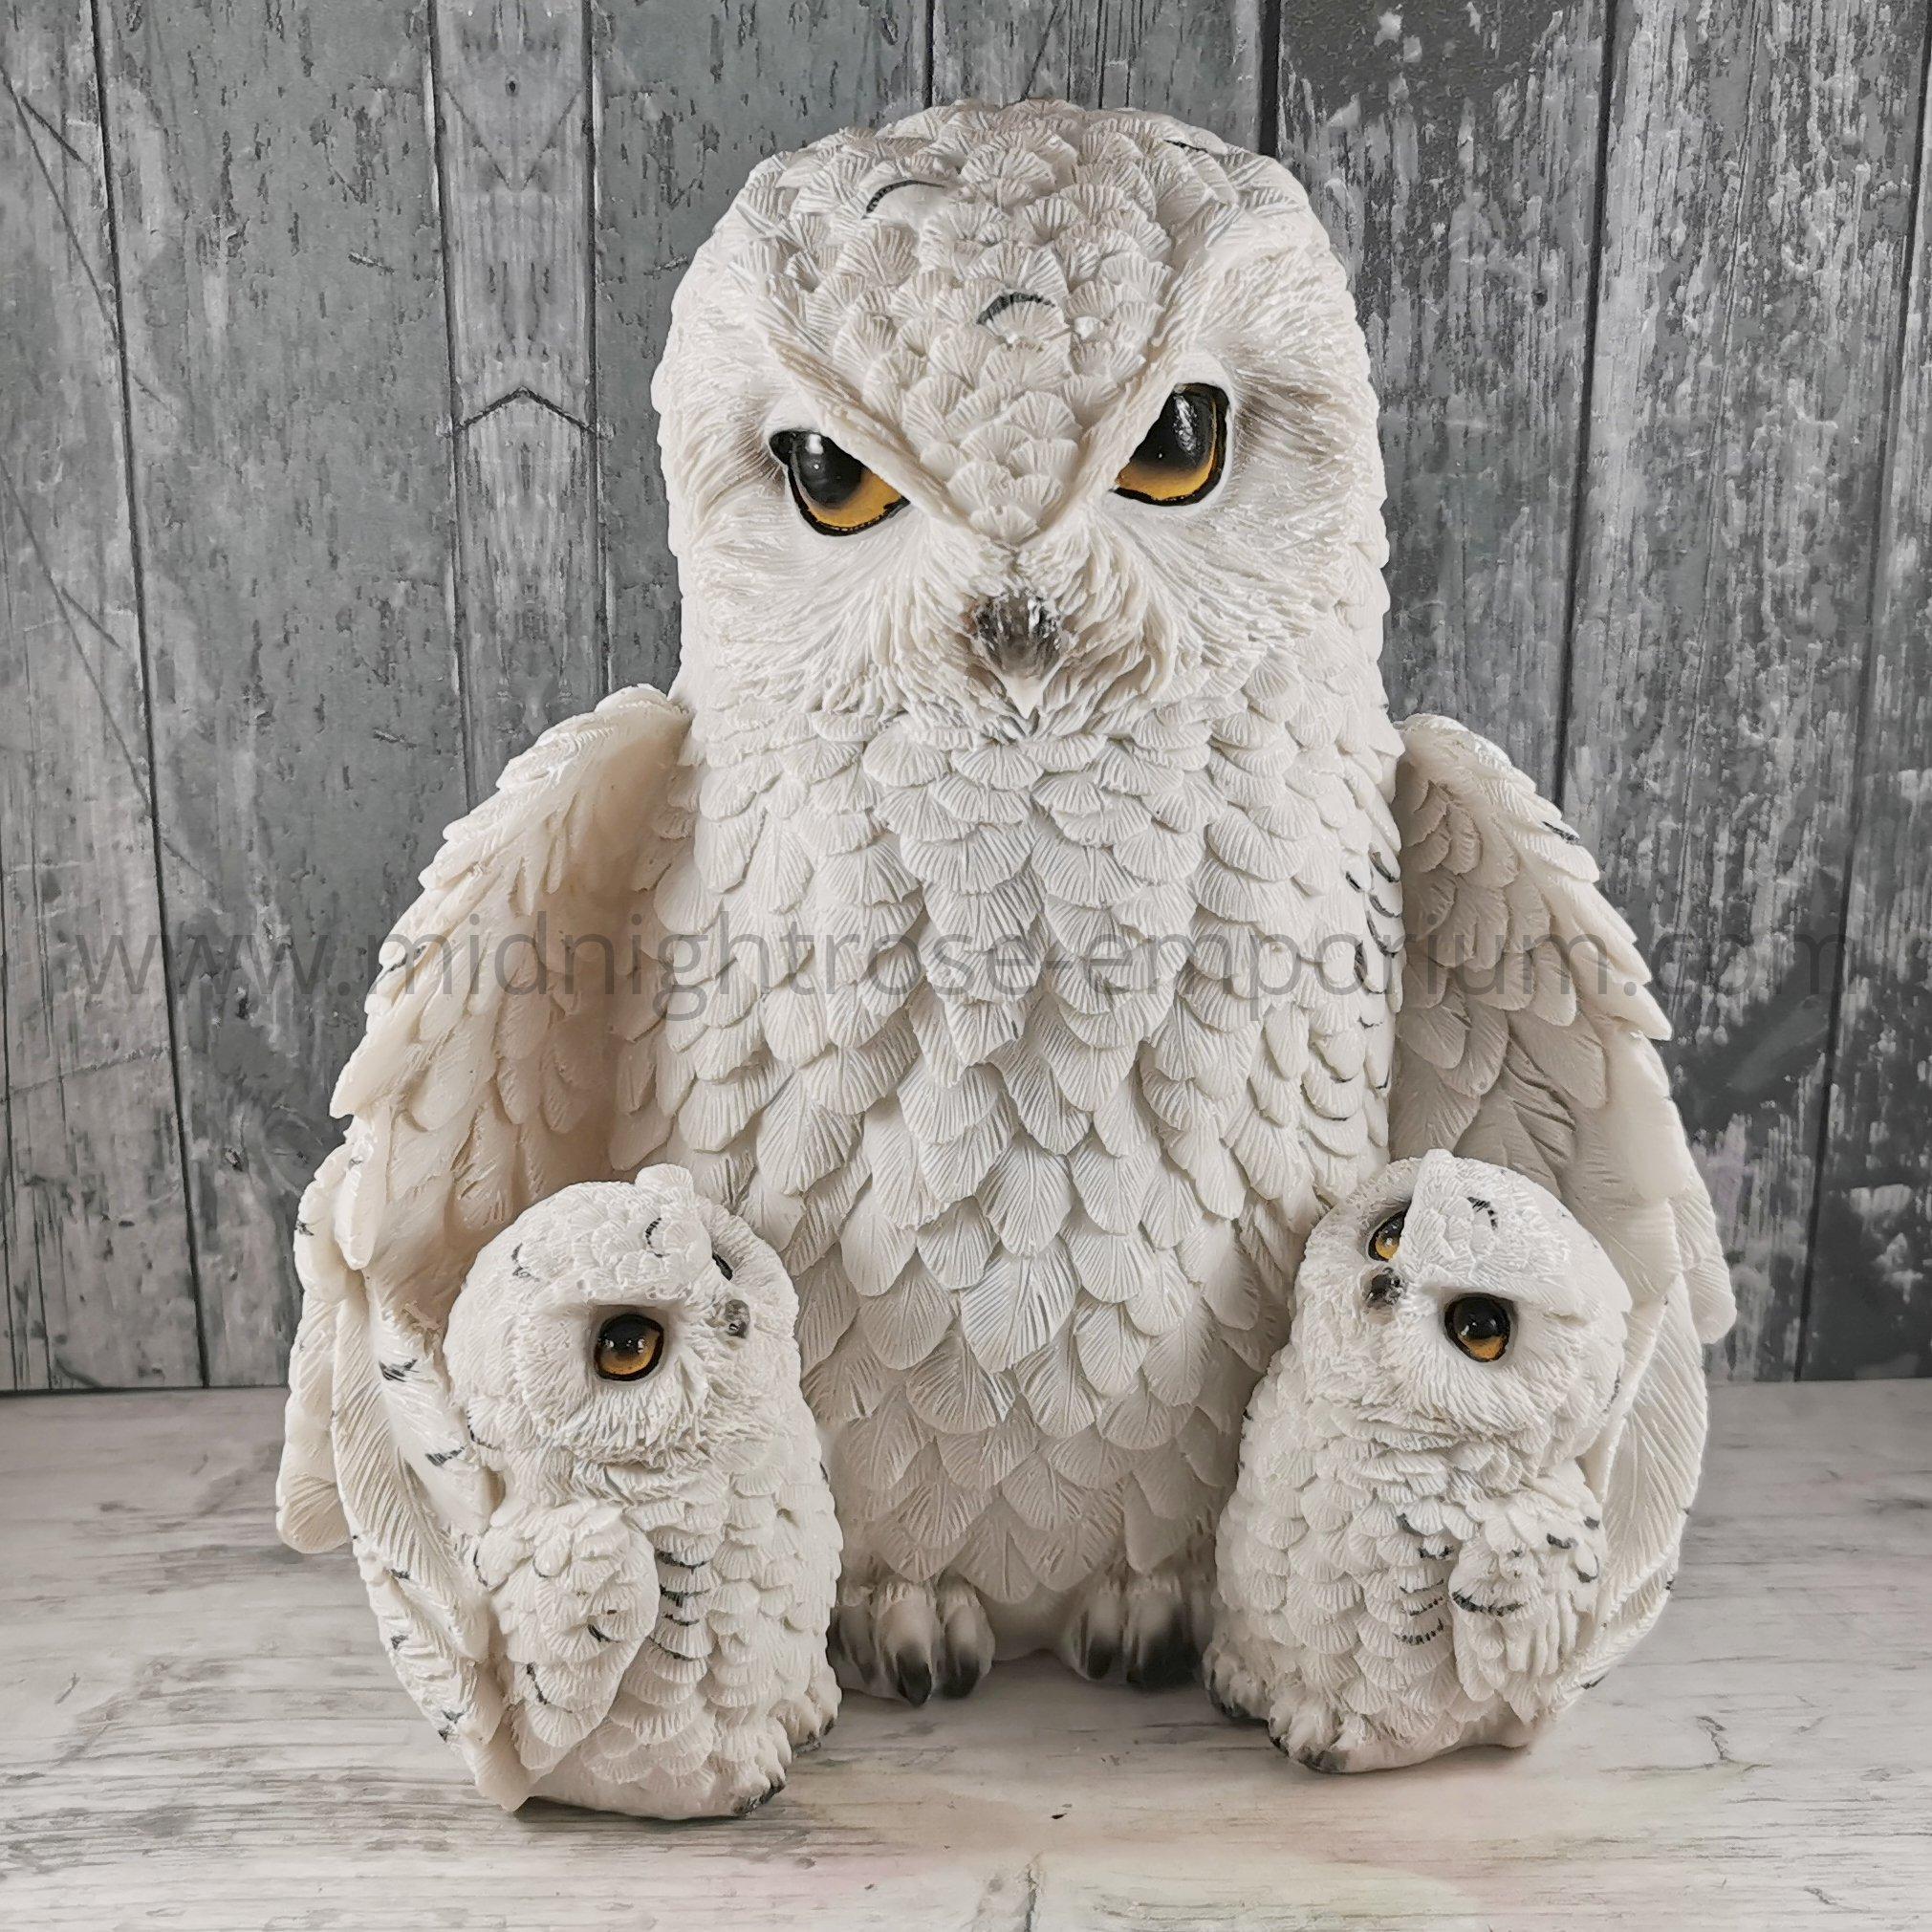 Feathered Family Snowy Owls Figurine 21.5cm